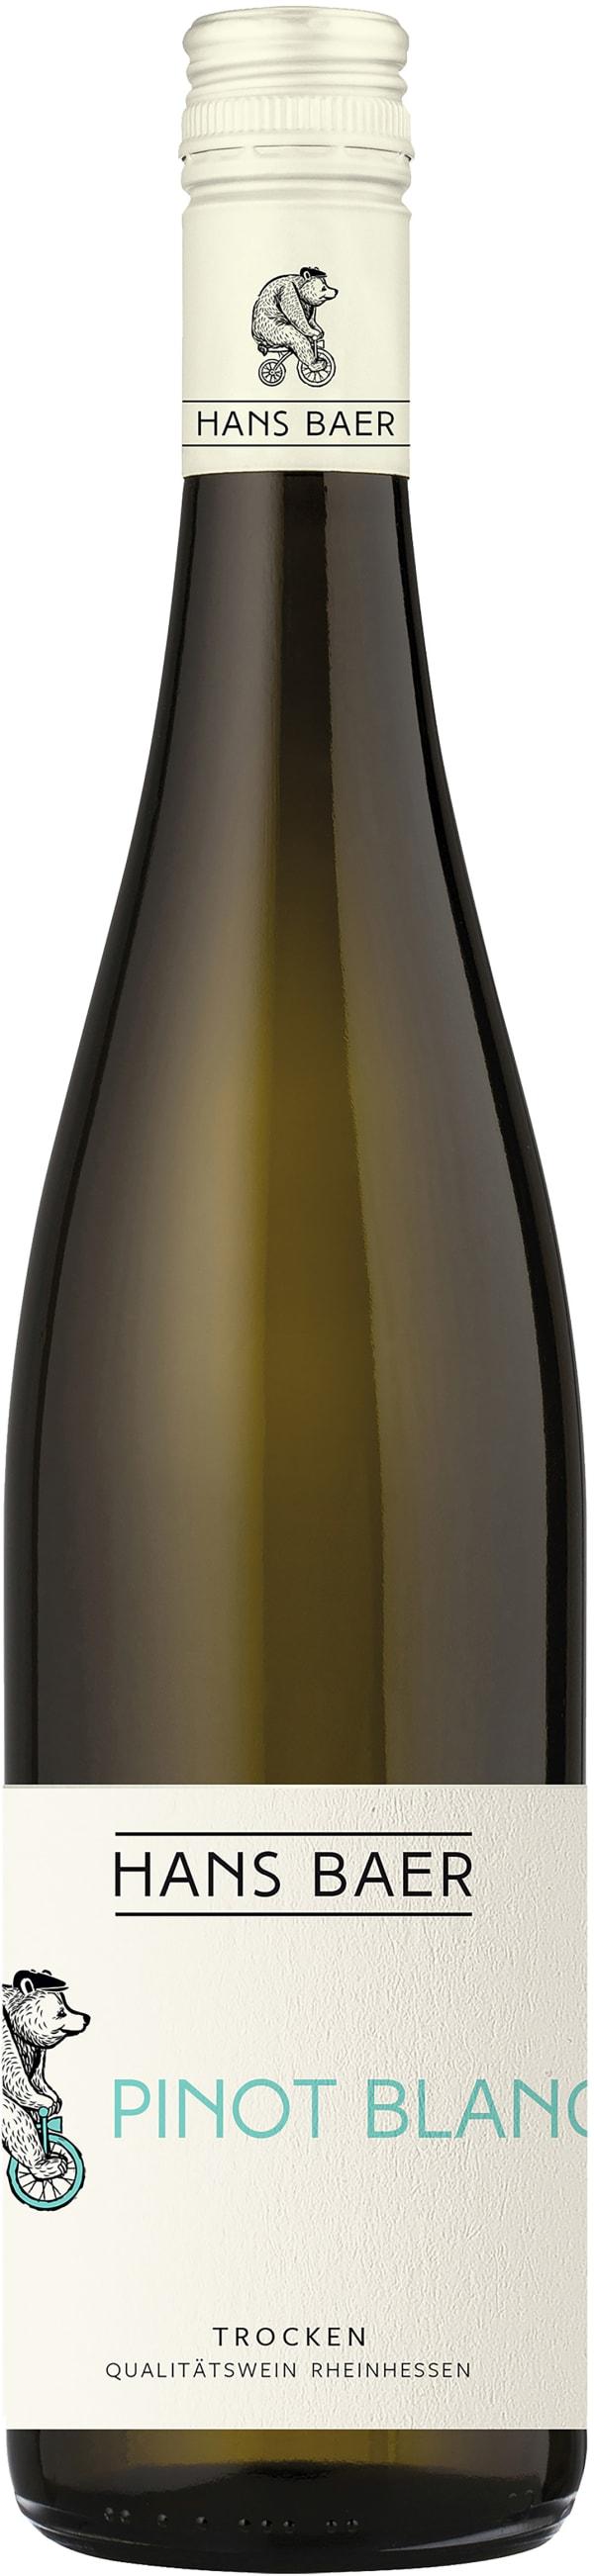 Hans Baer Pinot Blanc 2018